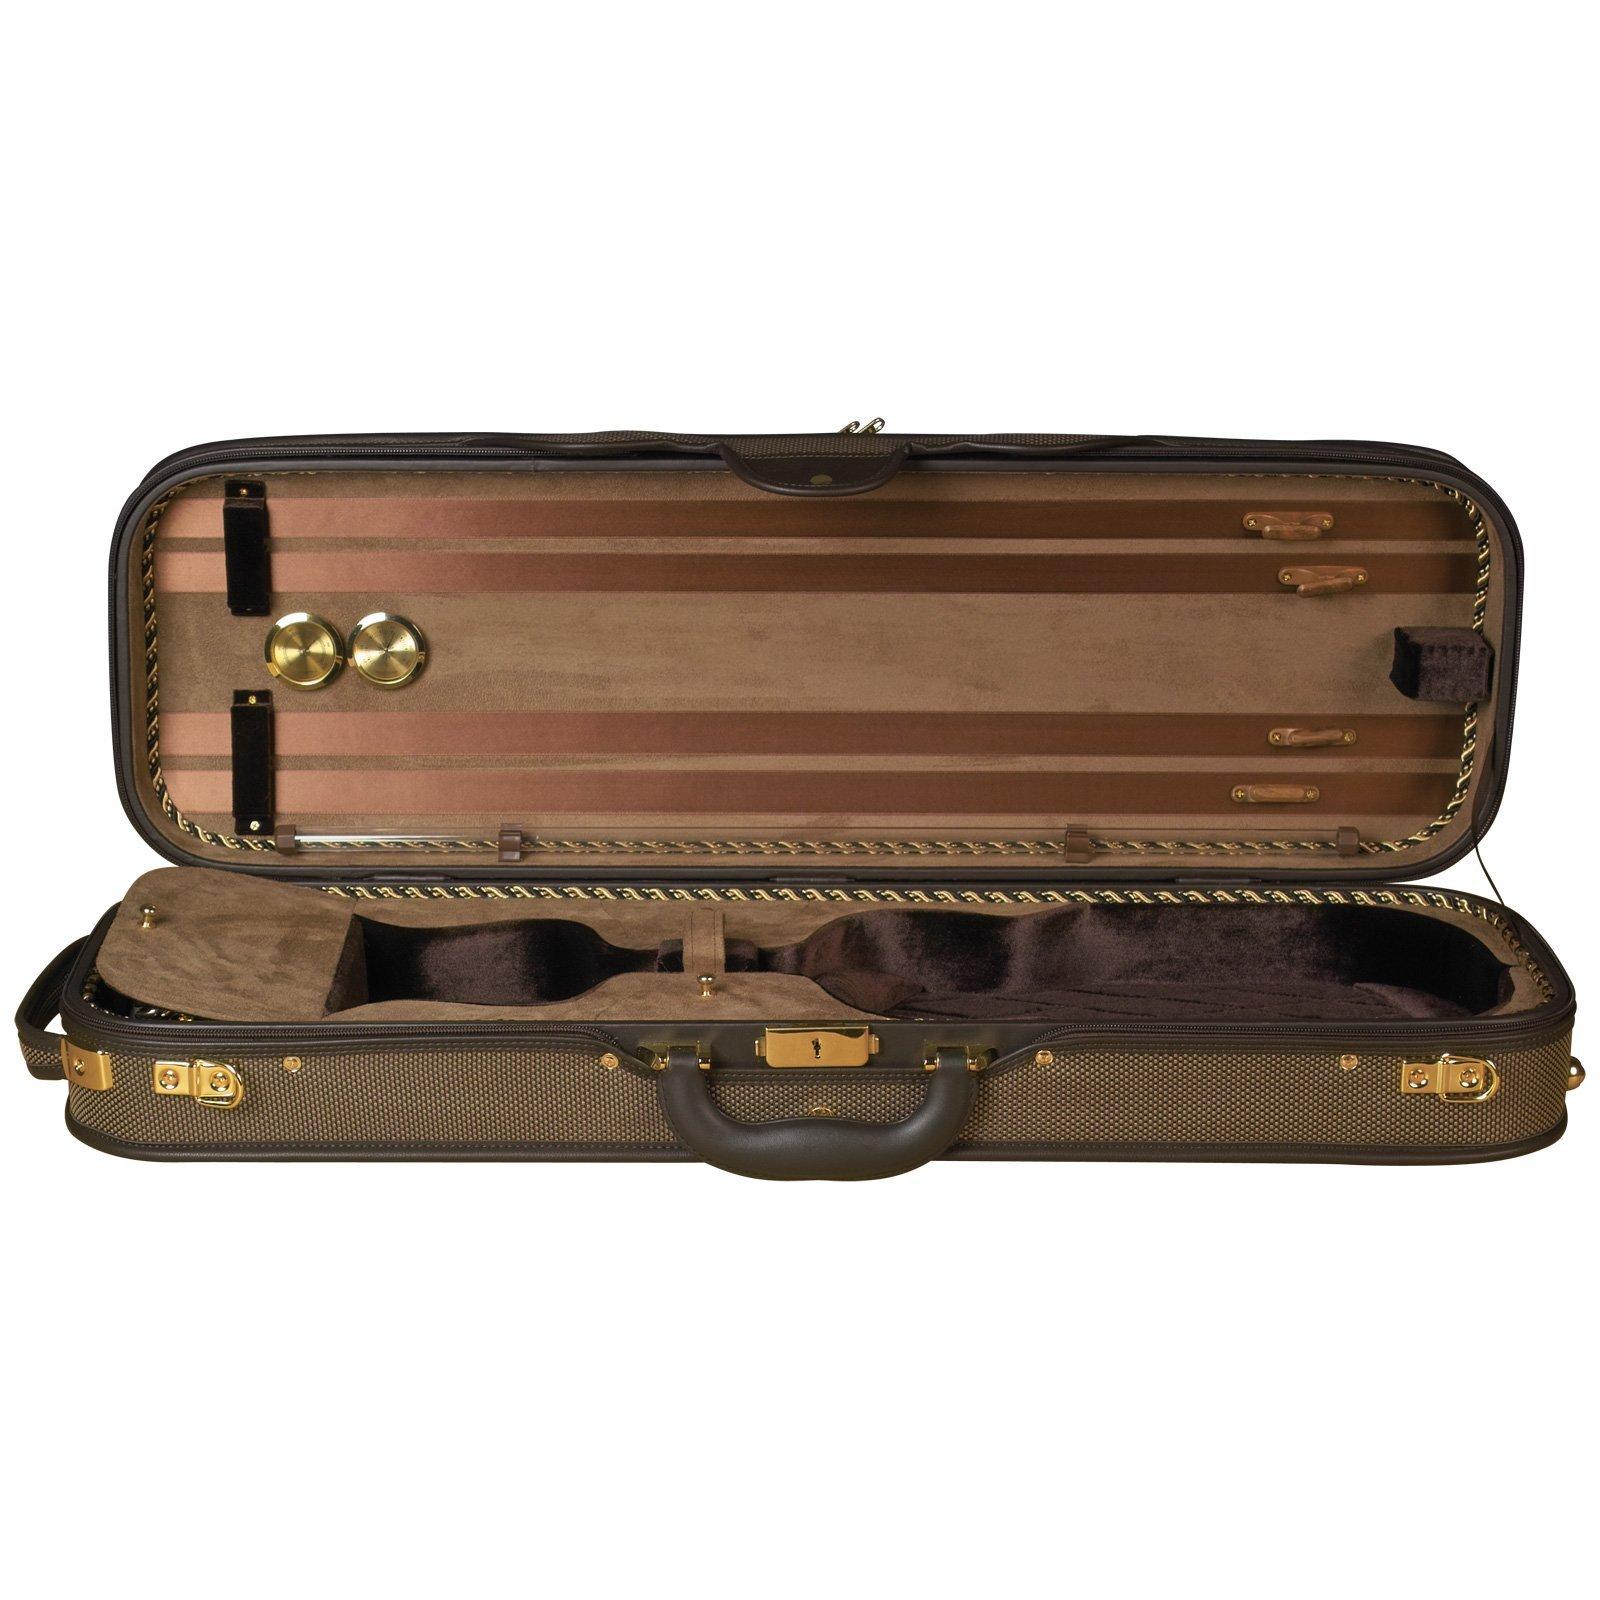 Baker Street BK-4020 Luxury Violin Case - Oblong by Baker Street Products (Image #1)